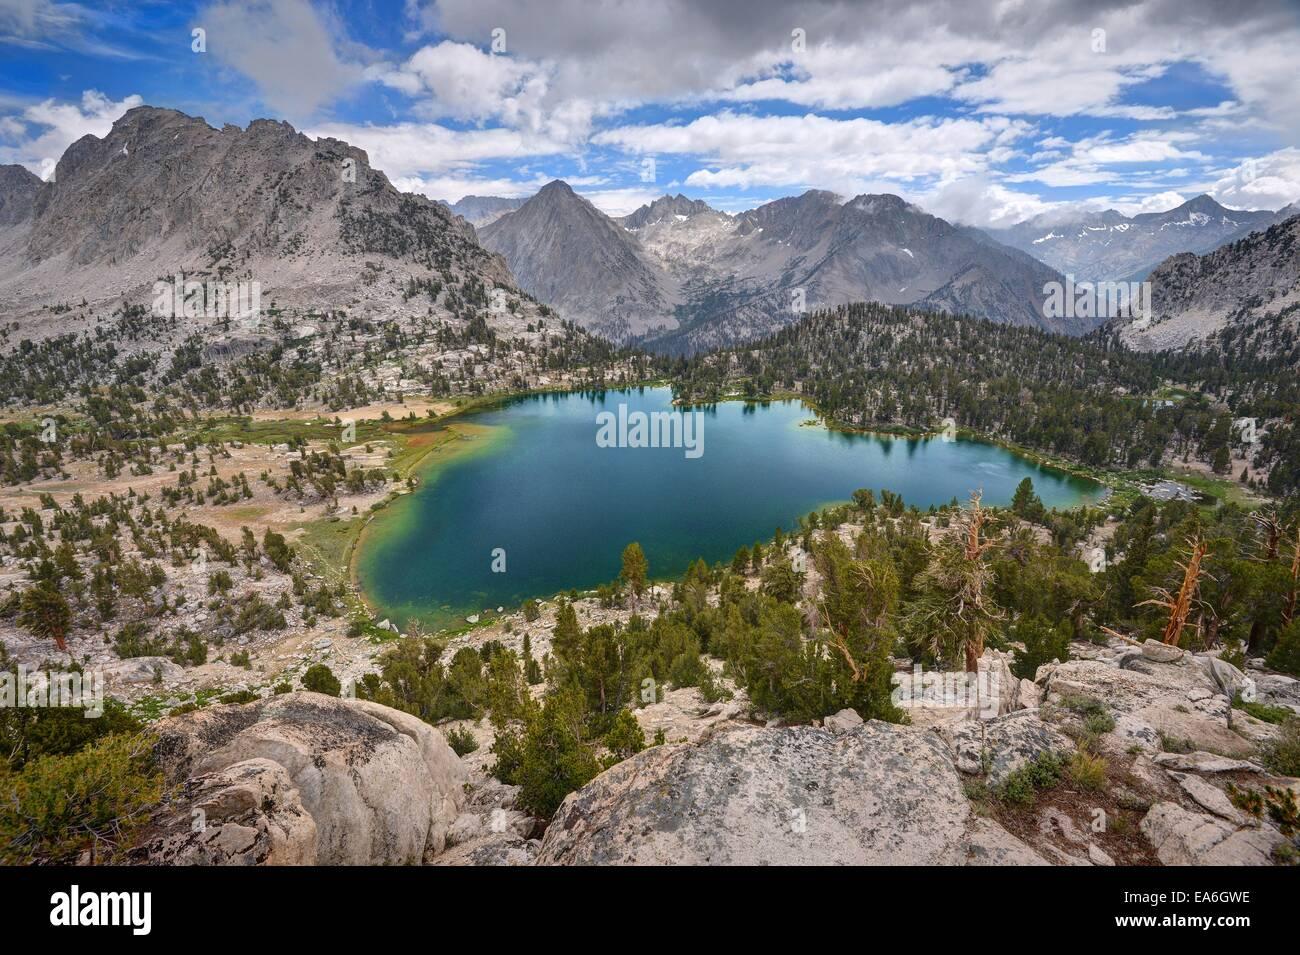 Stati Uniti, California, Ansel Adams Wilderness Area, Inyo National Forest, Spettacolare Bullfrog Lago Immagini Stock